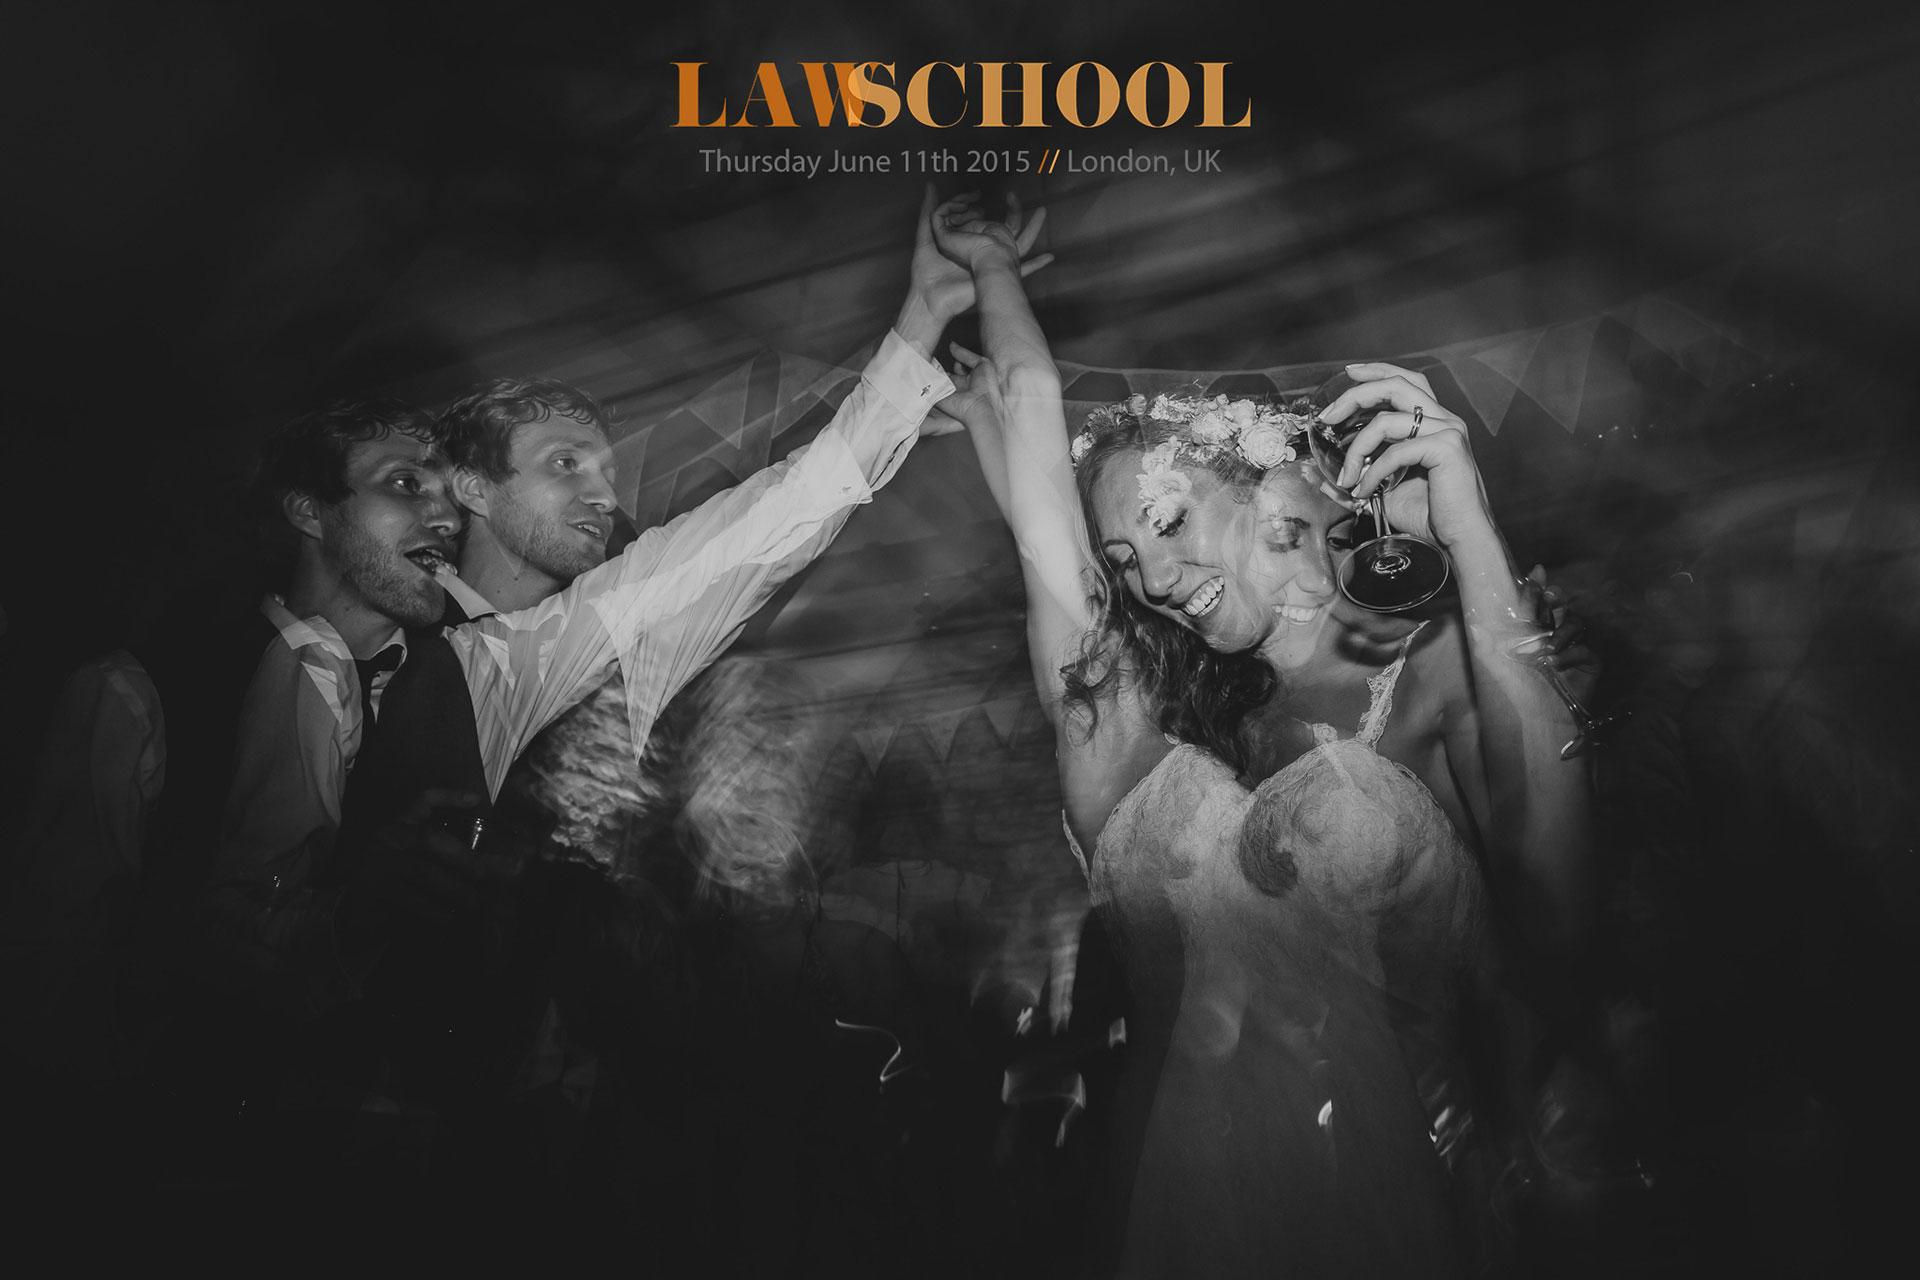 Law School / Wedding Photography Workshop / June 11th 2015 / London, UK